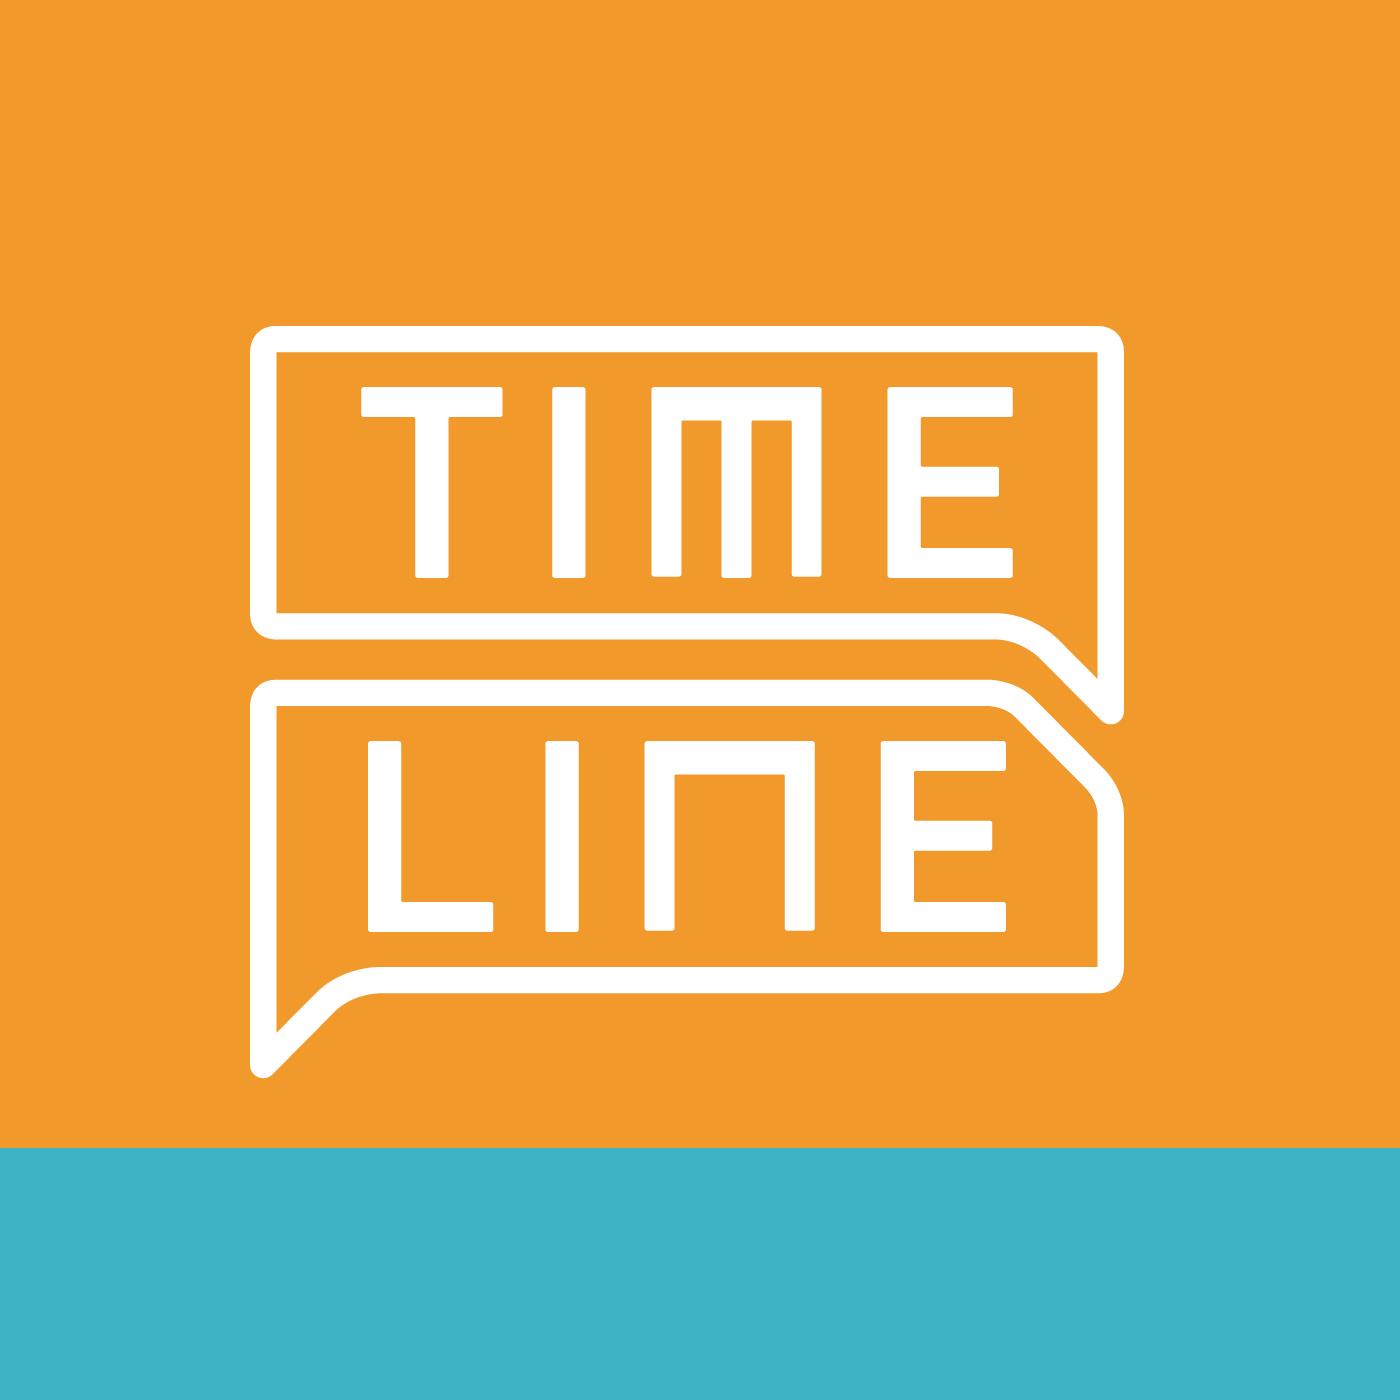 Timeline Gaúcha 04/08/2017